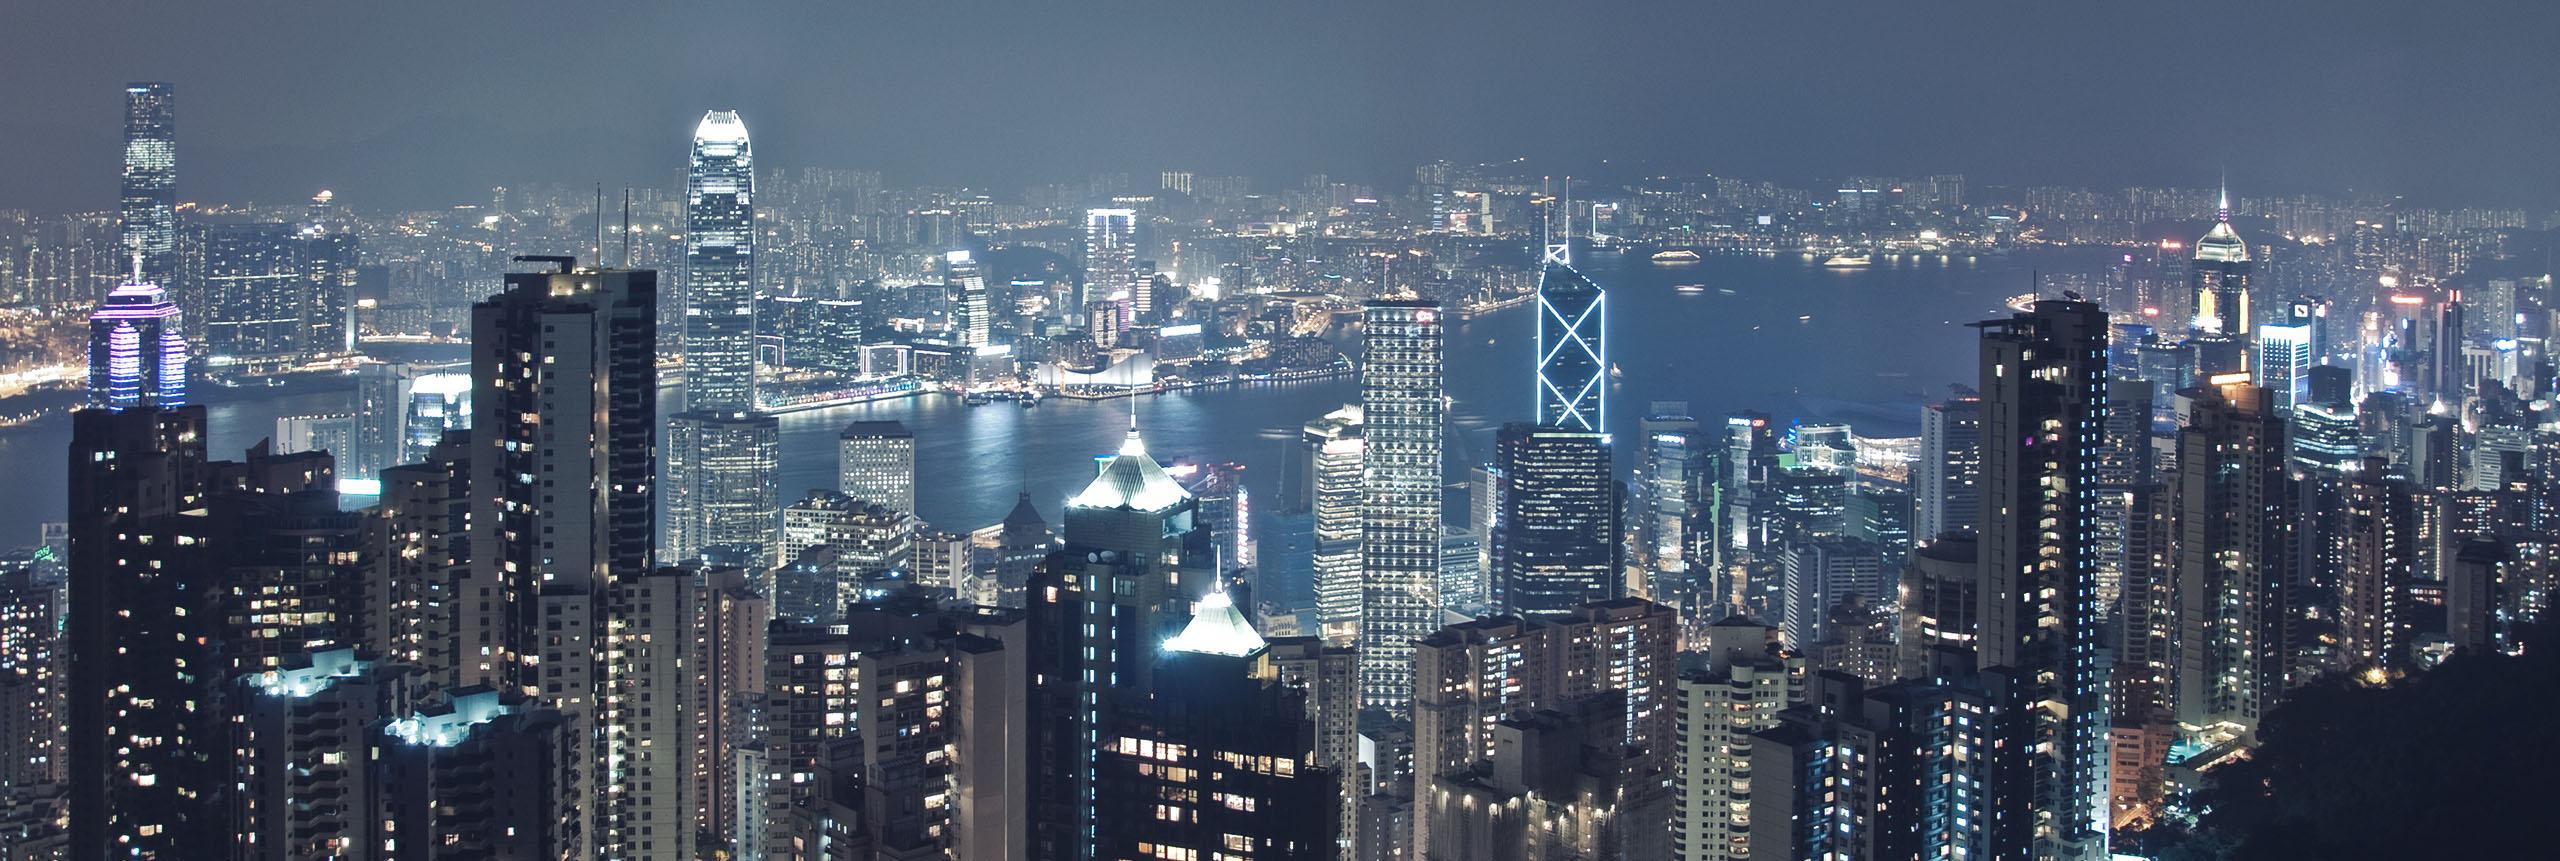 Hong_Kong_Skyline_Unsplash_Pano